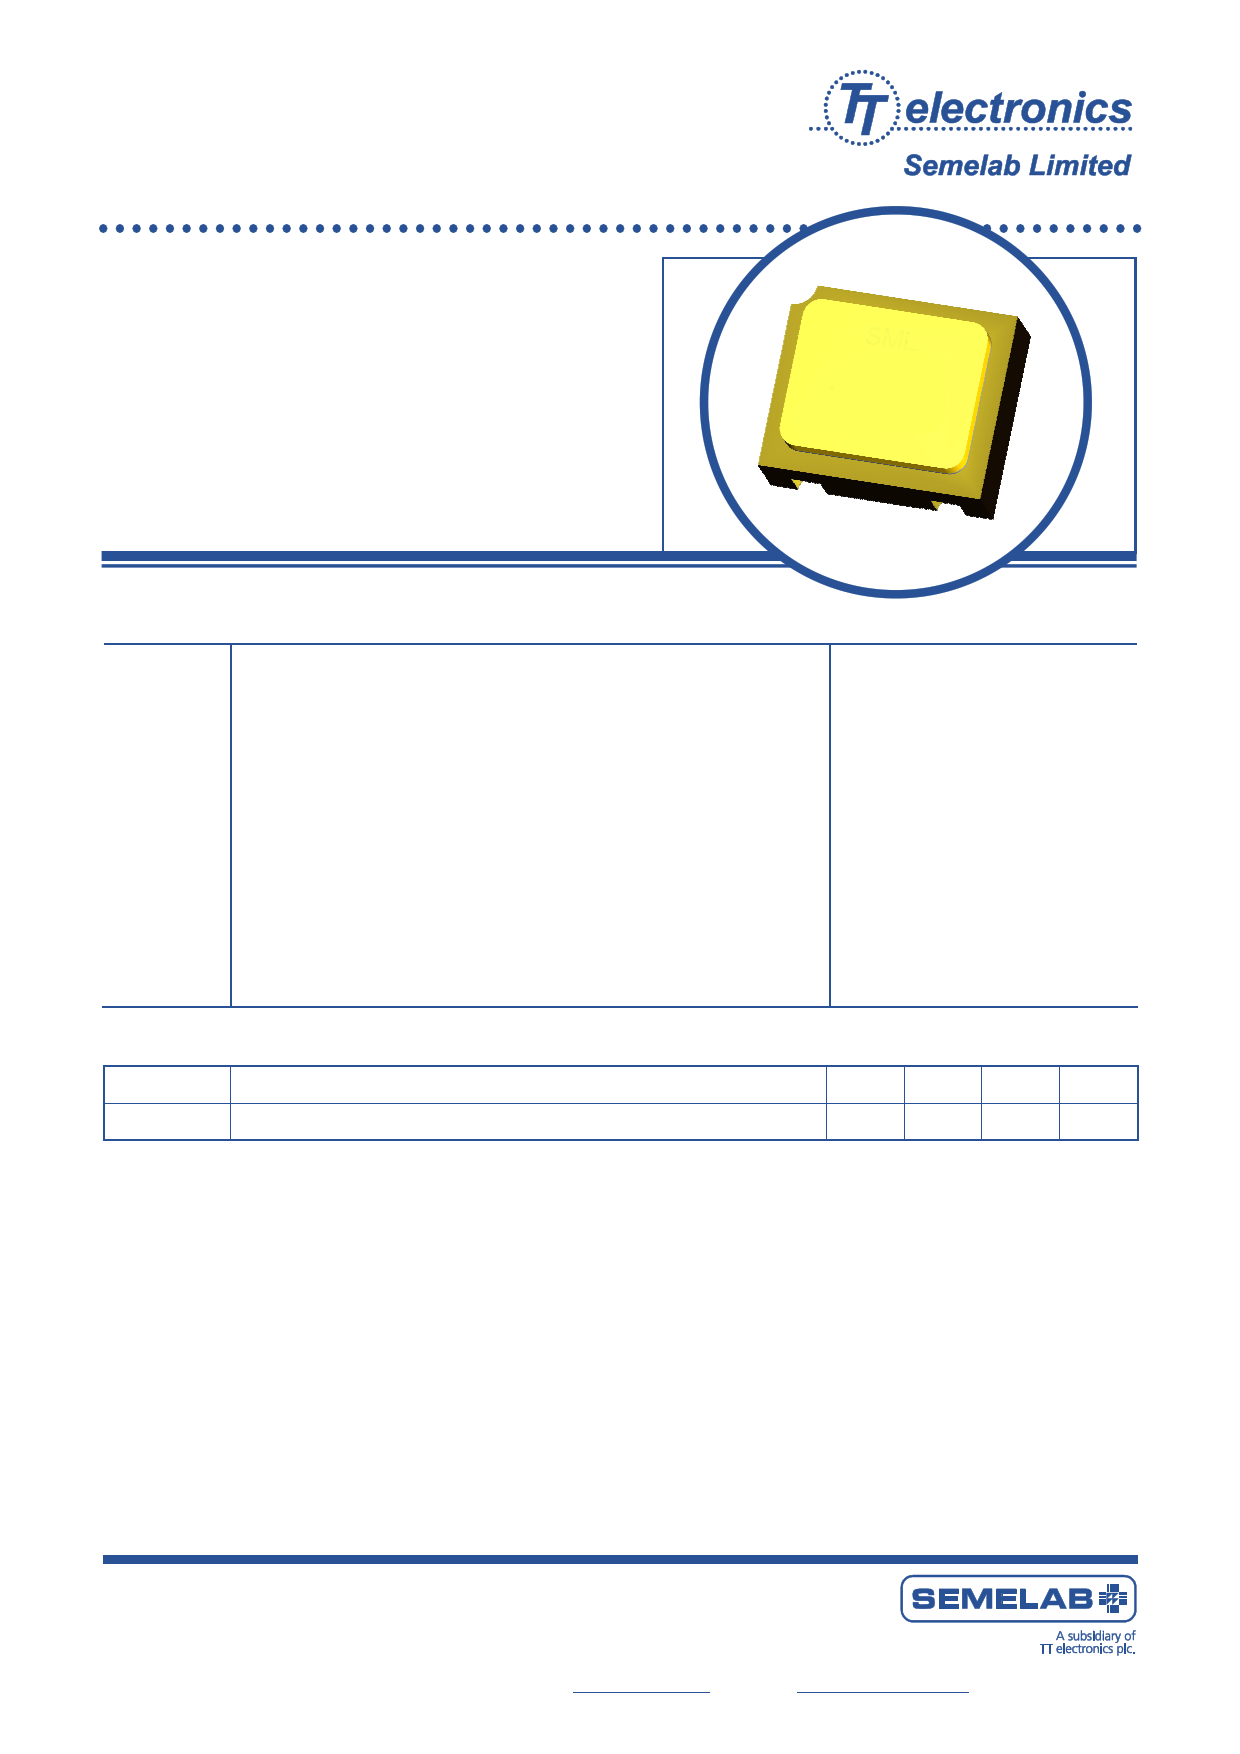 BFR92A 데이터시트 및 BFR92A PDF